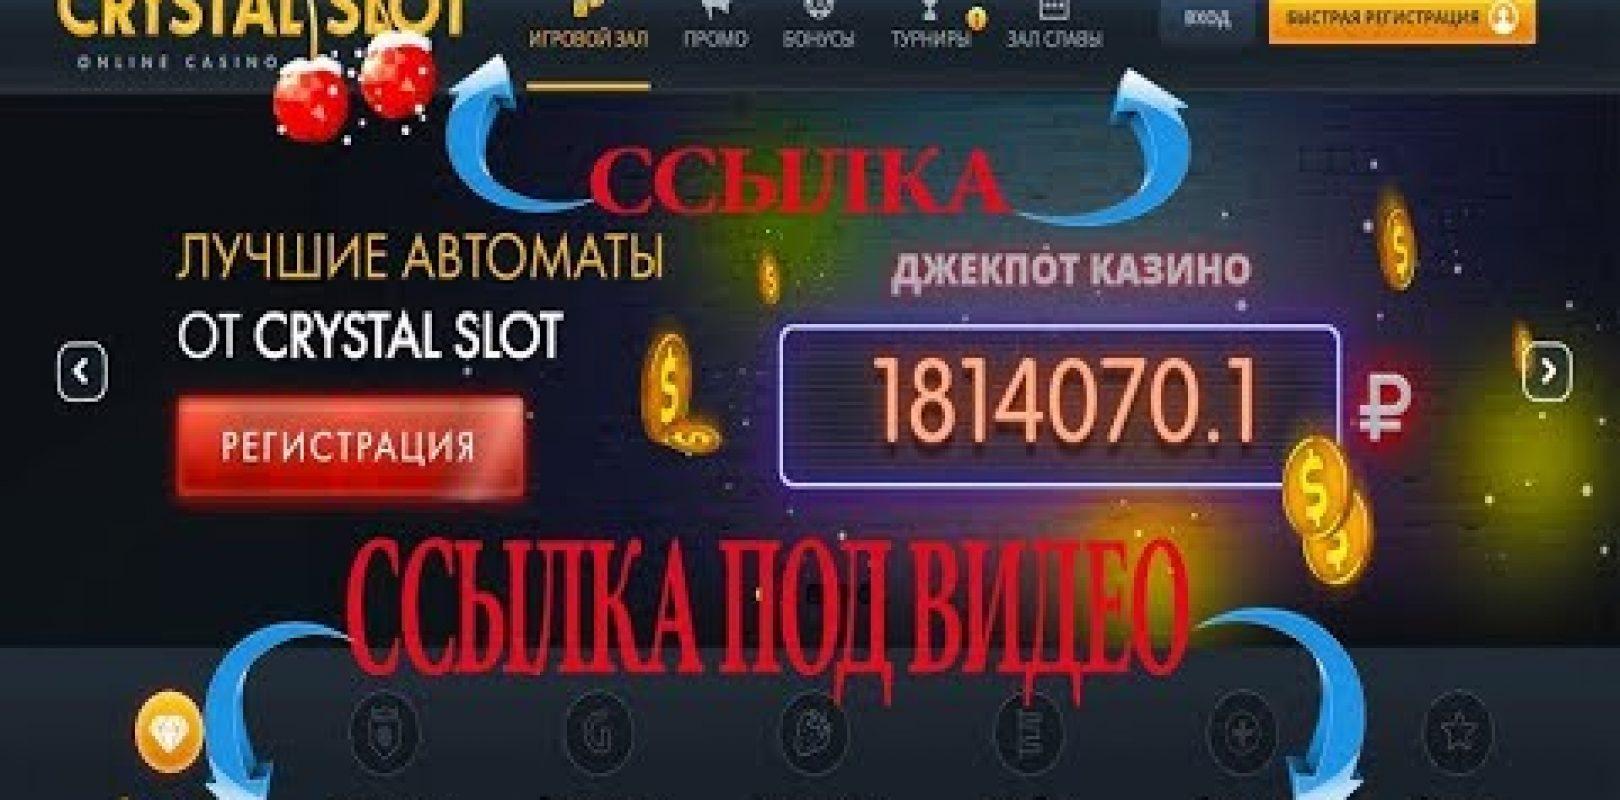 Я выйграл в онлайн казино